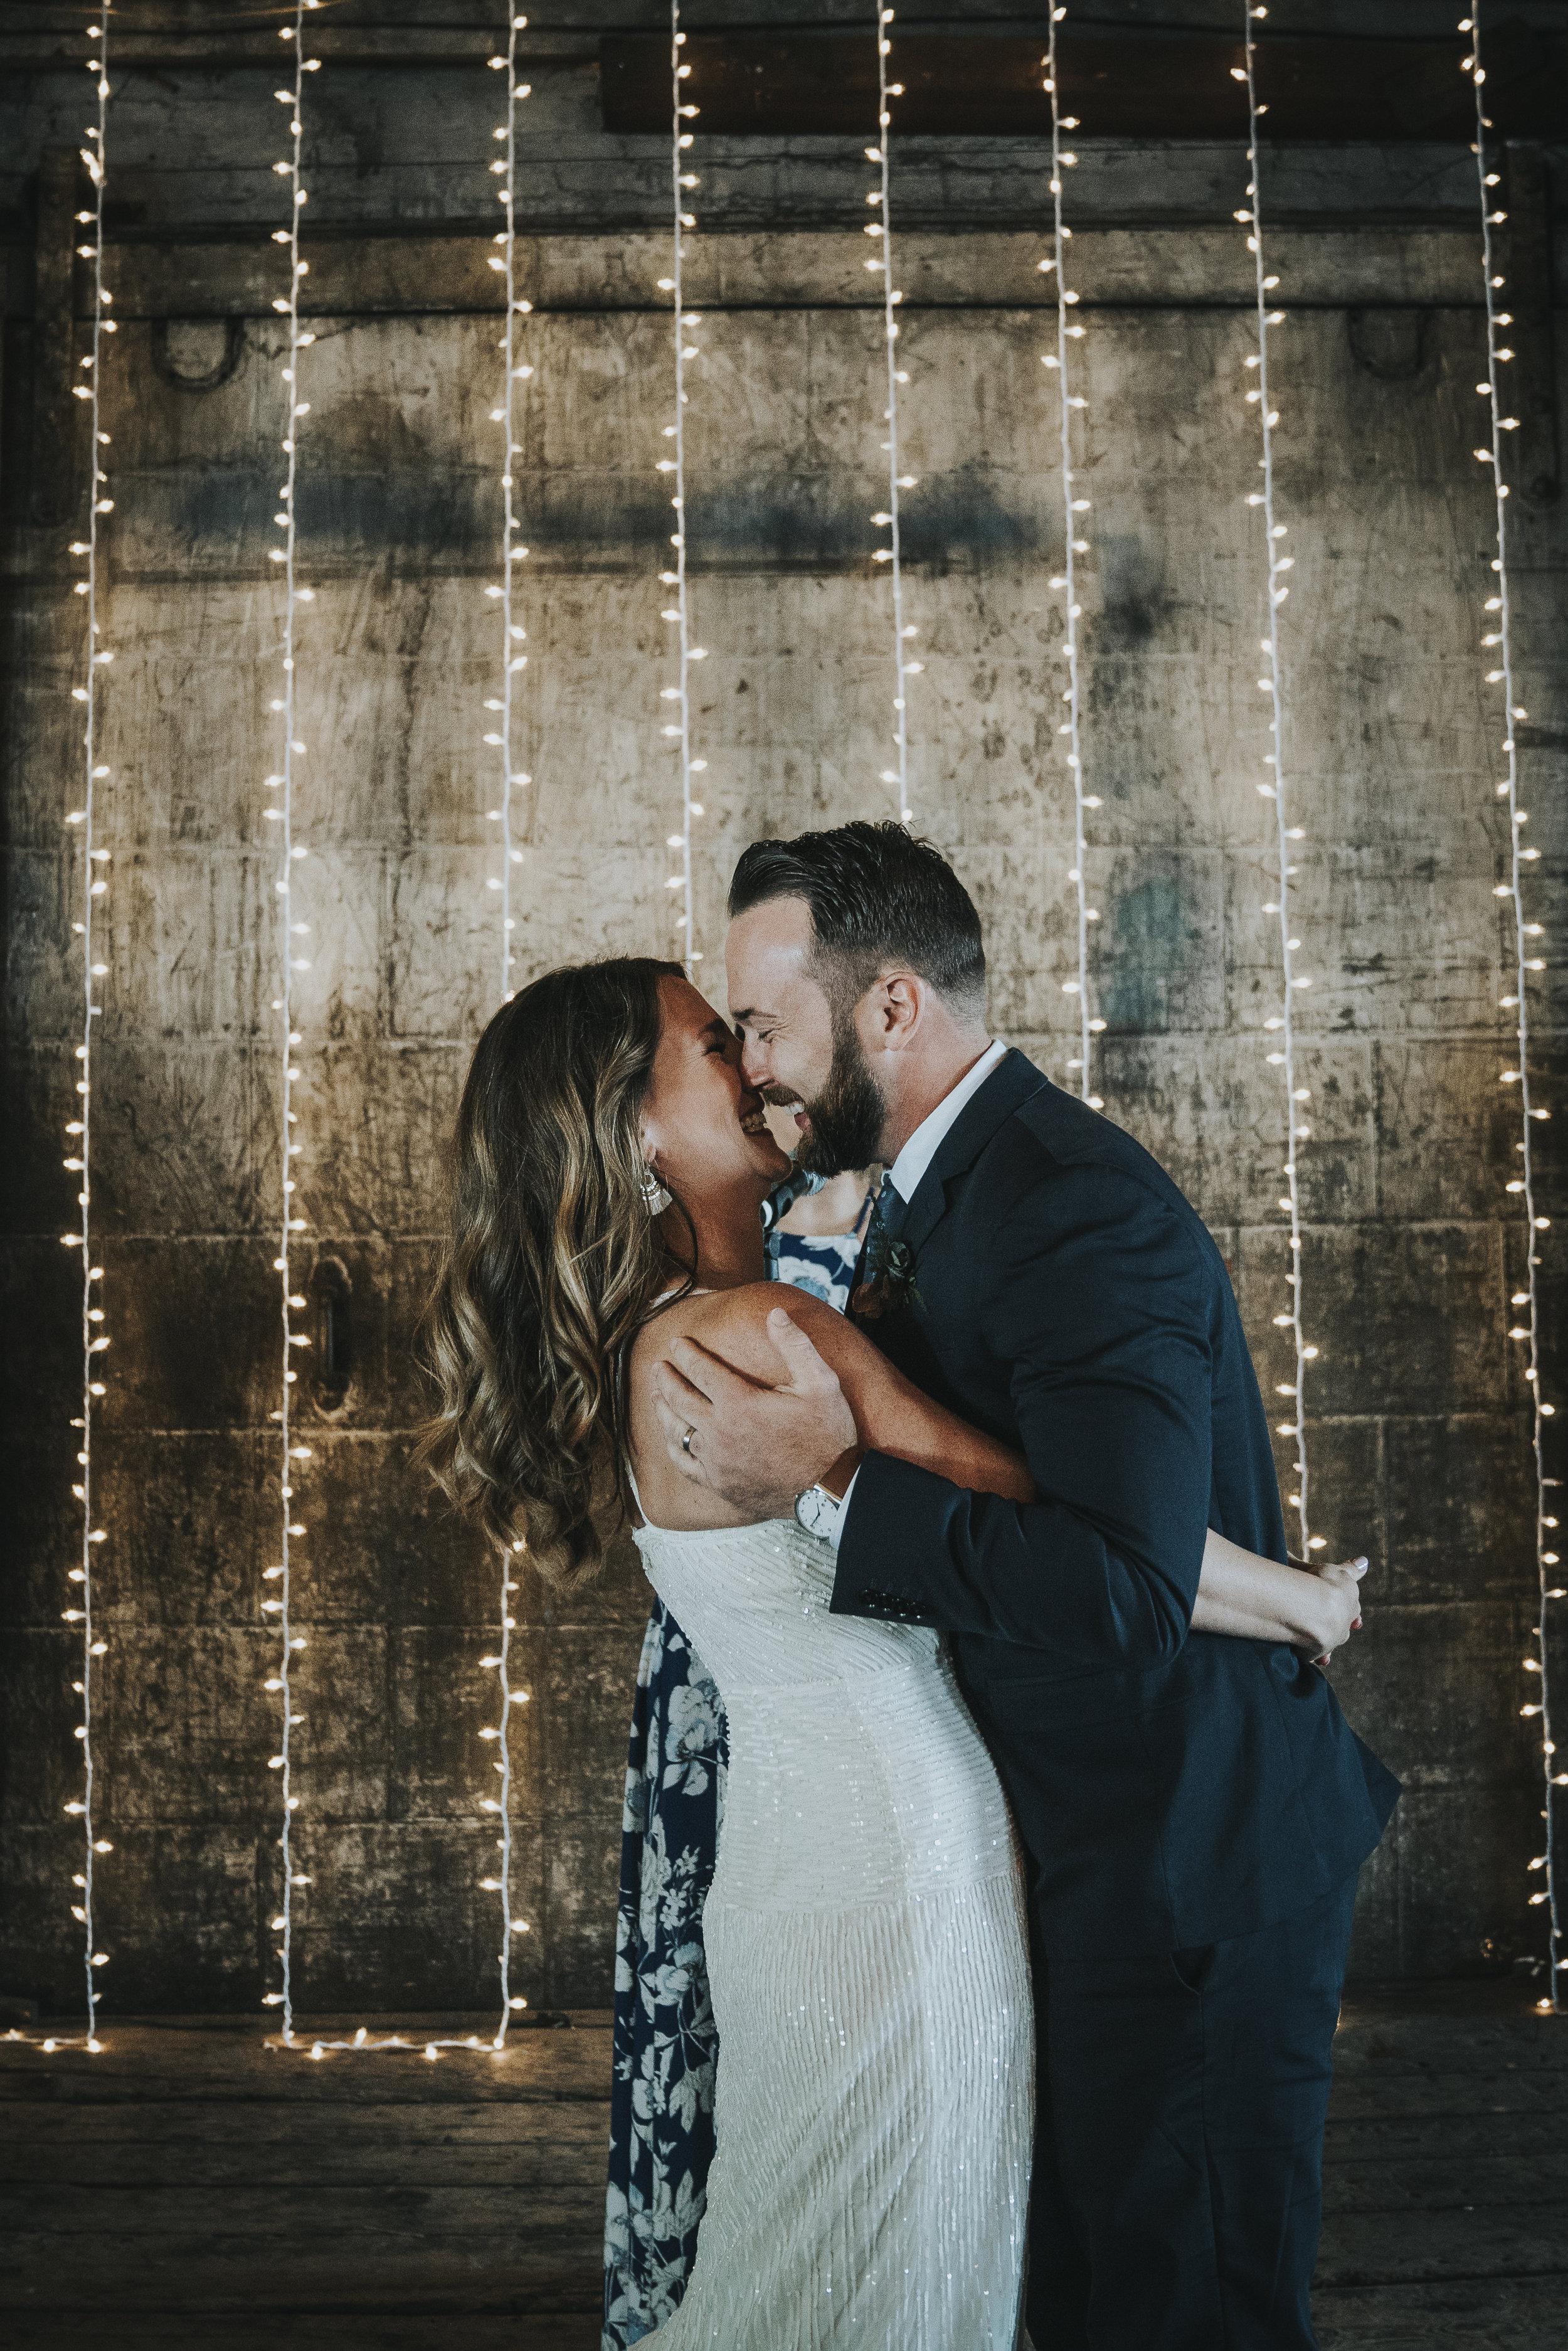 Wedding2017_Kyle&Maria_C3_5.28.17_JPGs (92 of 285).jpg